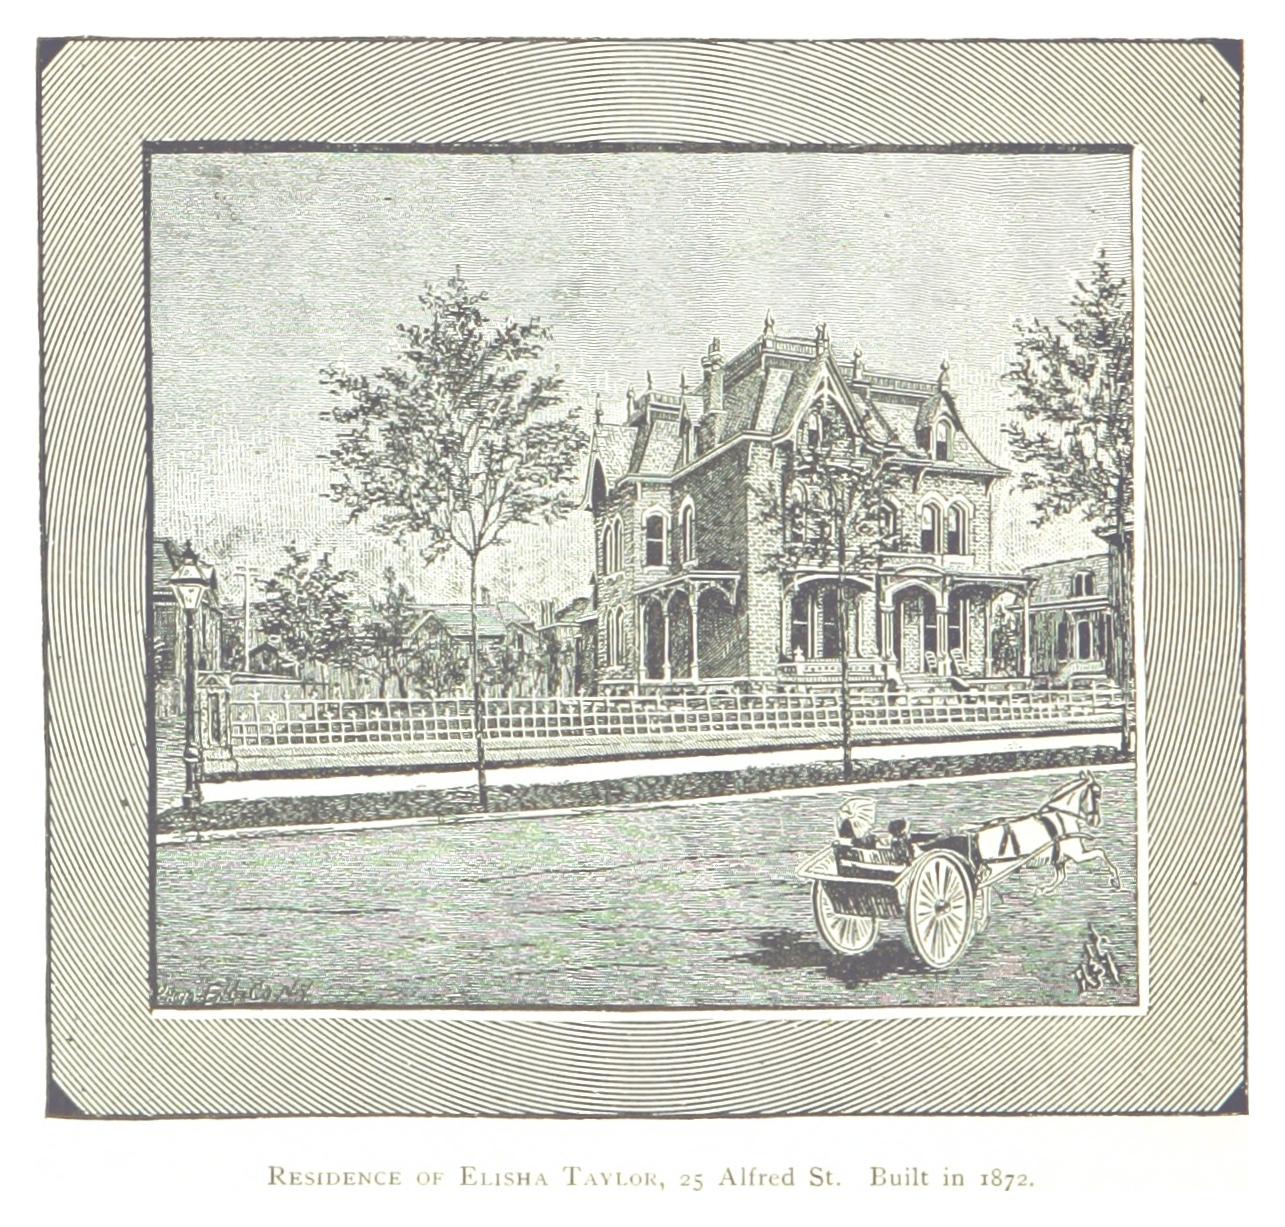 The Elisha Taylor home in 1884